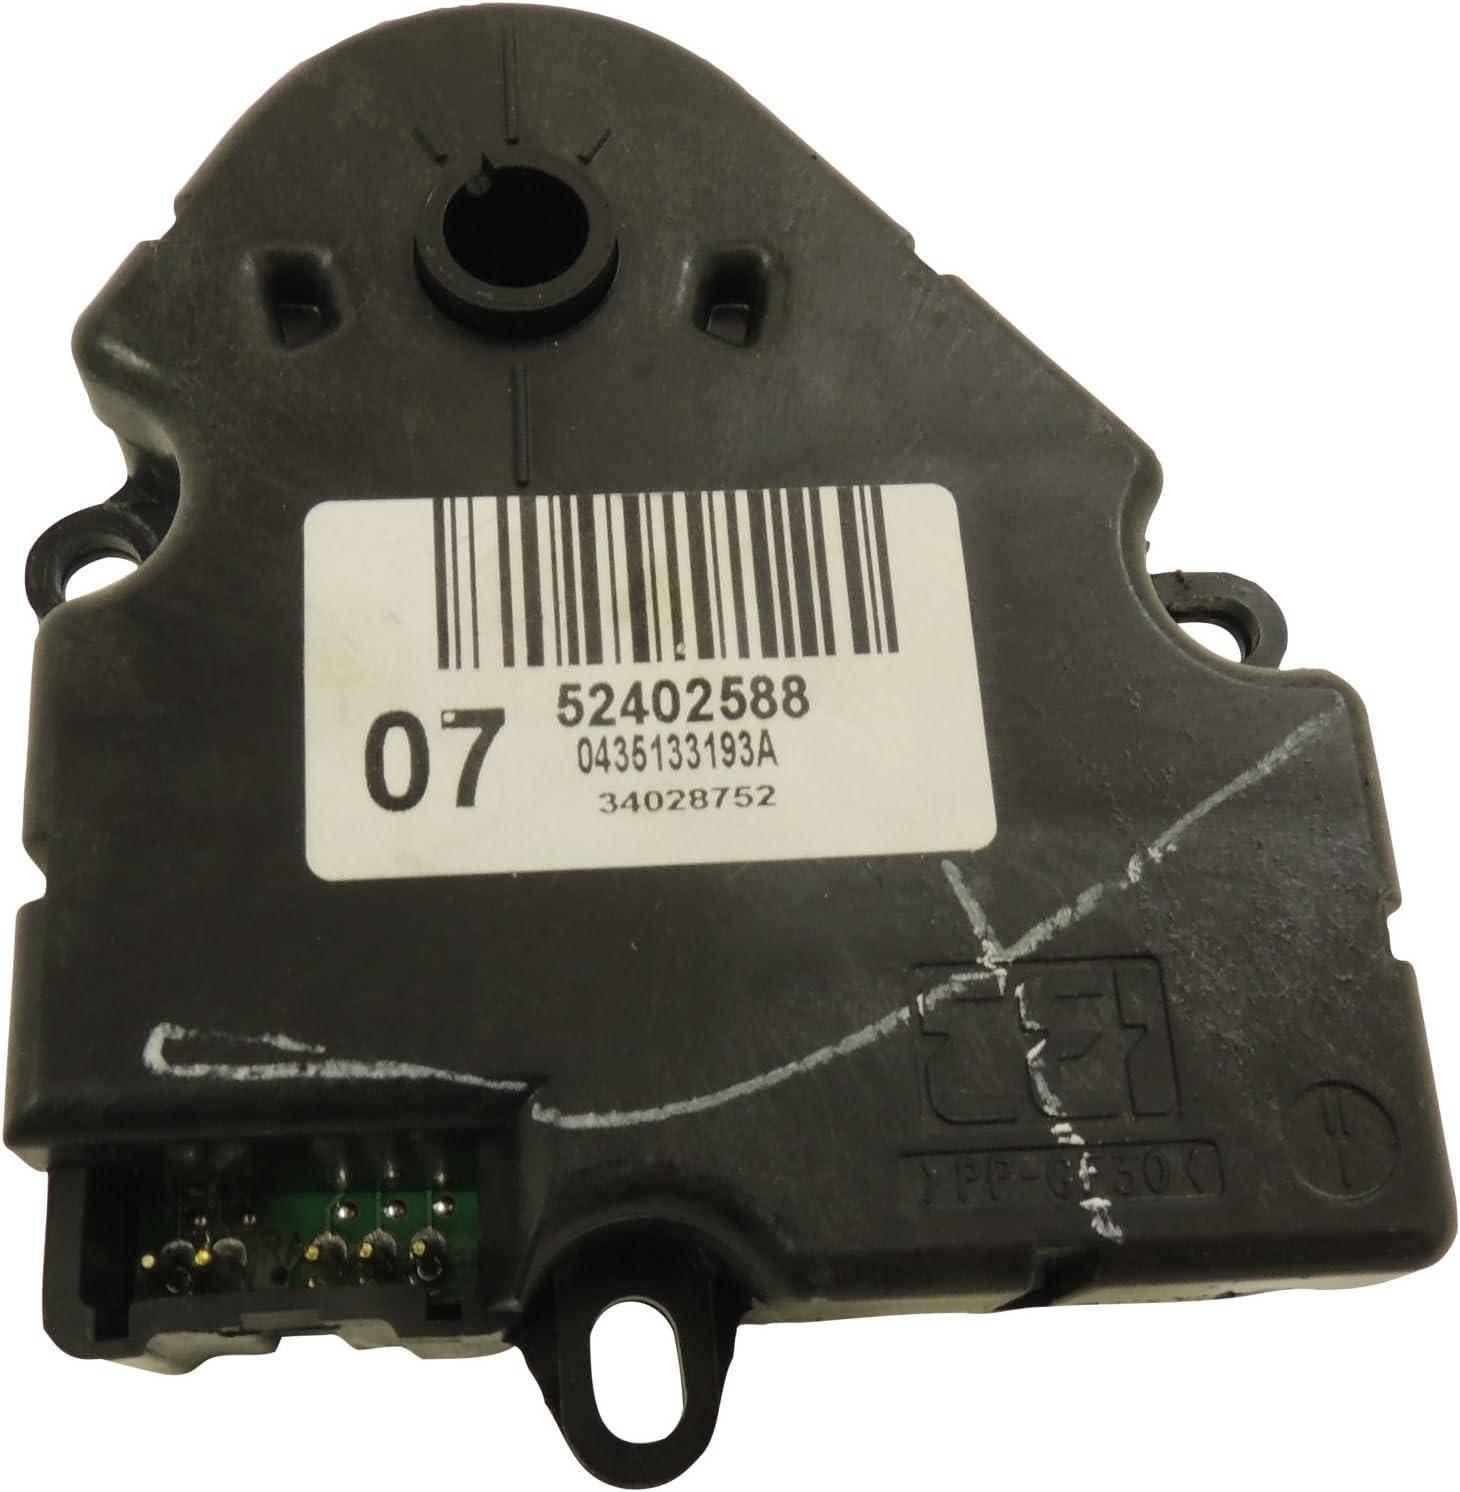 Auto elektrische Kraftstoffpumpe 16141183947 f/ür E38 725 728i 730d